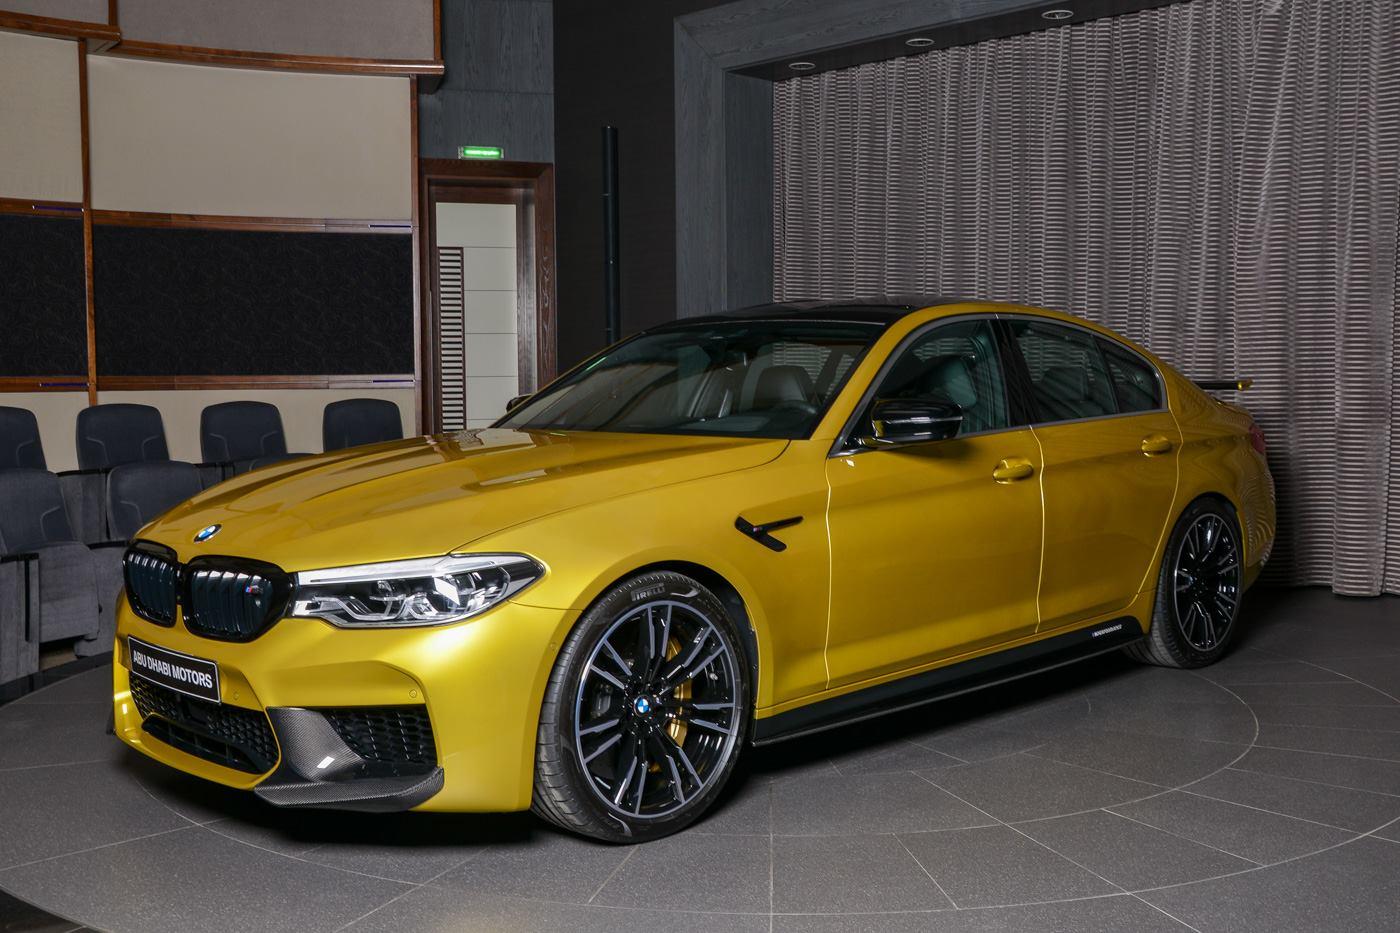 Austin Yellow BMW M5 Arrives in Abu Dhabi Wearing AC Schnitzer Goodies